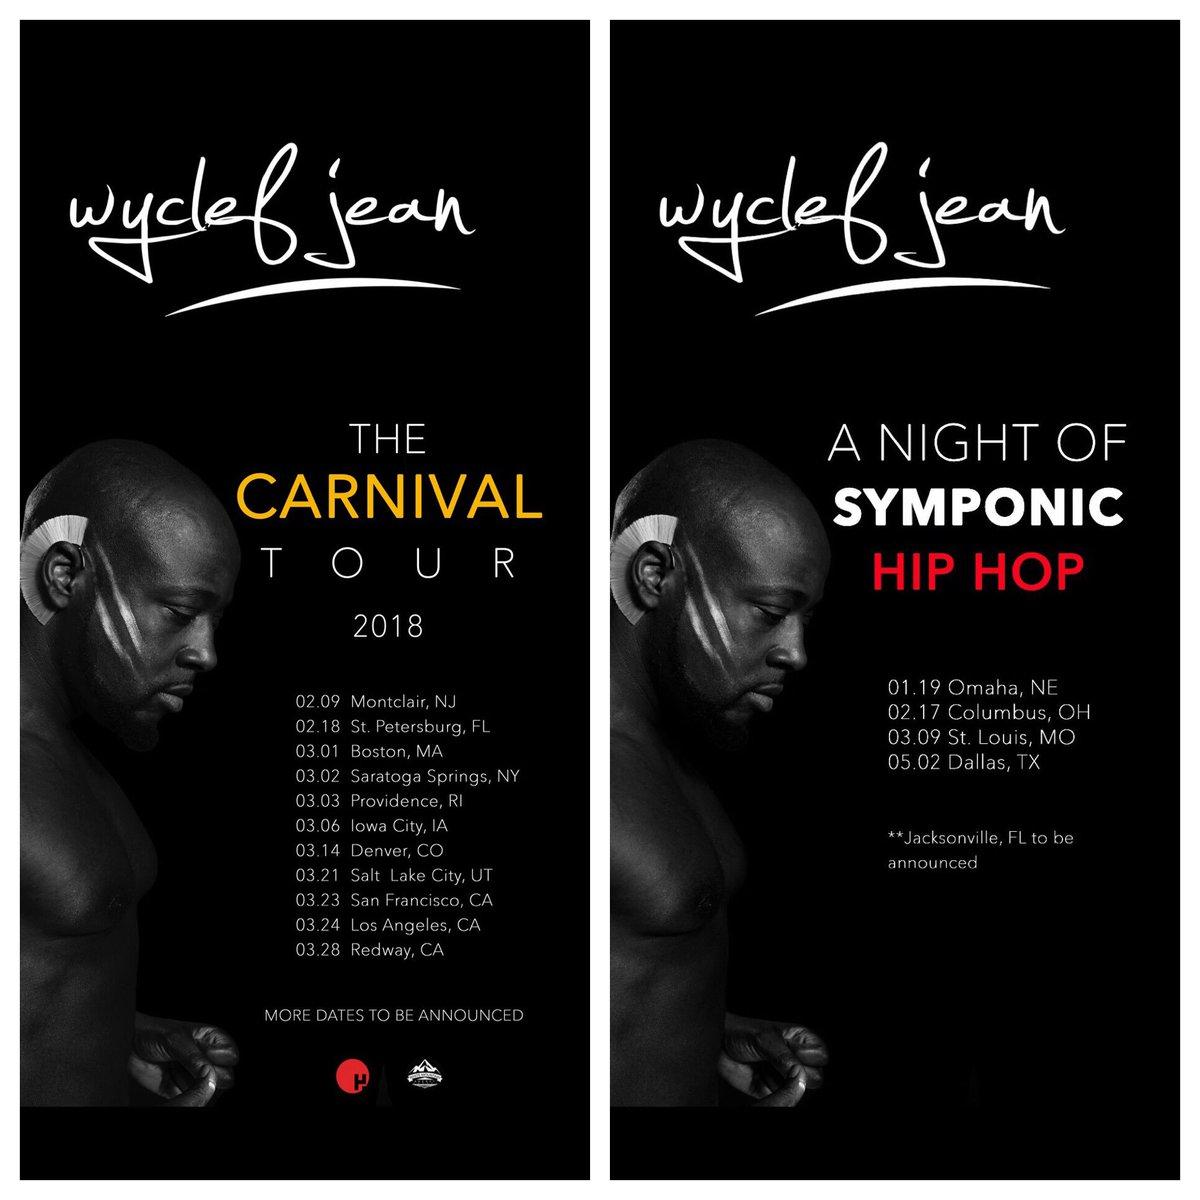 One Tour! Two Tour! All tickets at https://t.co/DyQ0VuBzcv https://t.co/AxpjnUsPnw